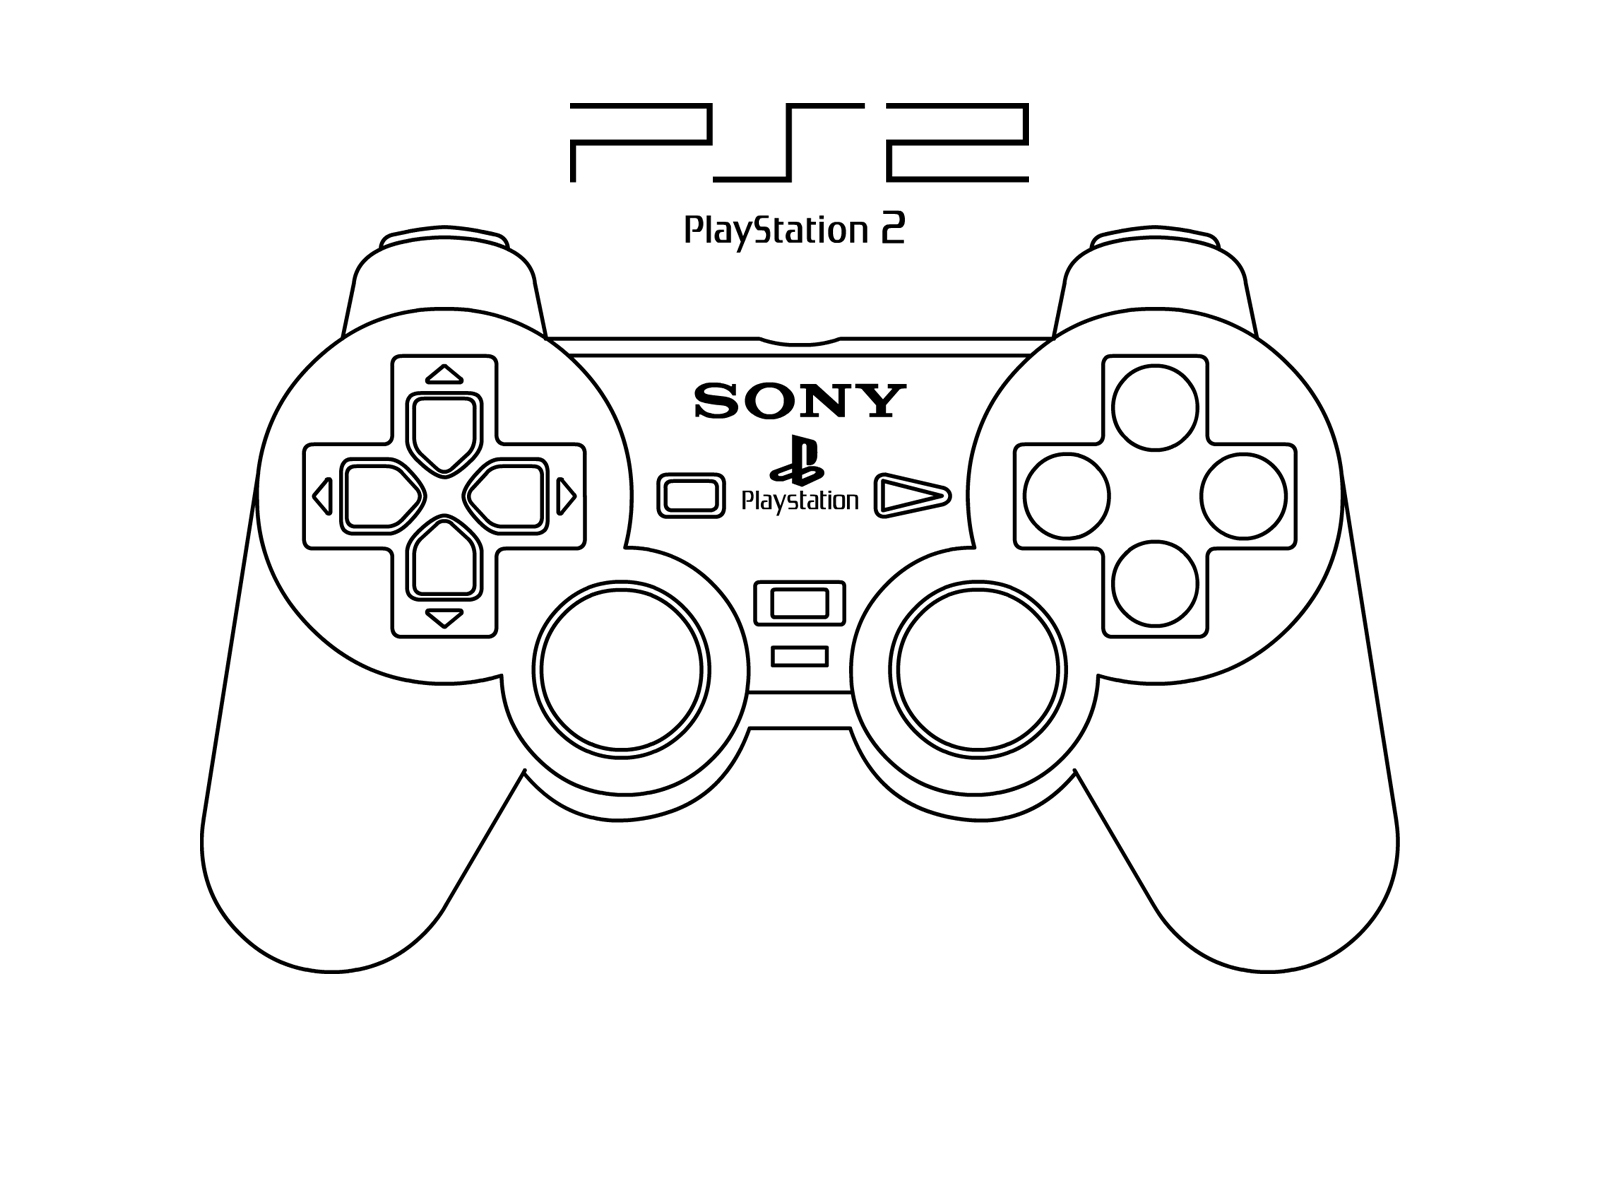 Playstation 2 Pad by oloff3 on DeviantArt